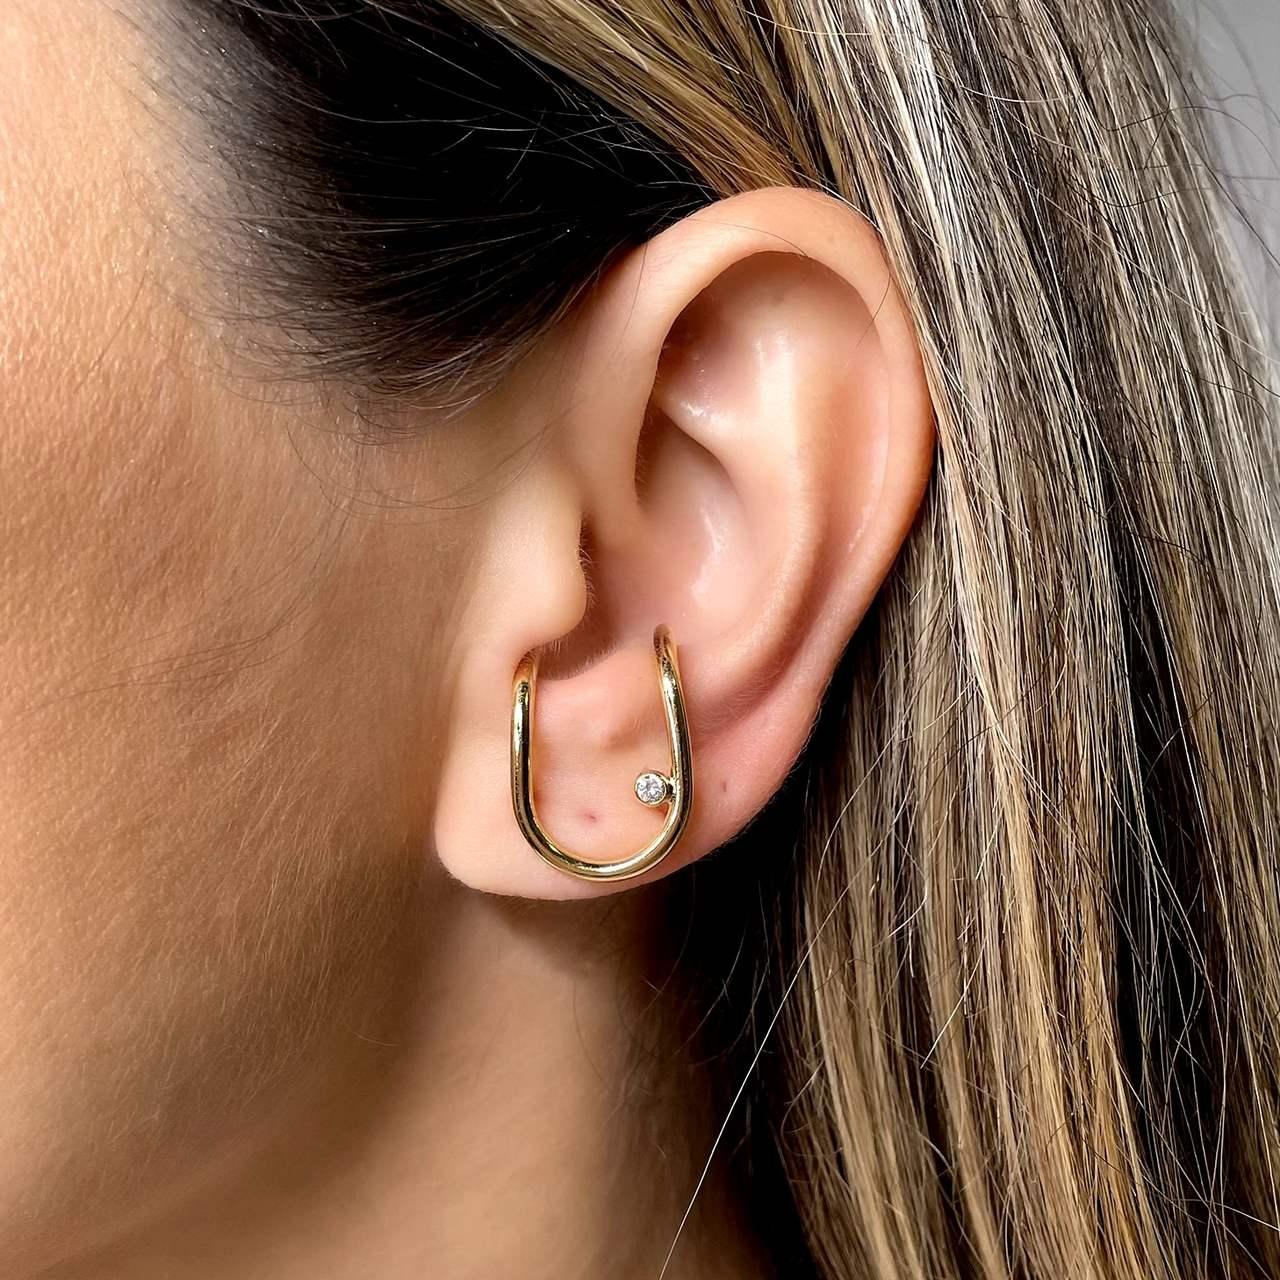 Ear Hook Formato U Liso 1 zirconia Banho Ouro